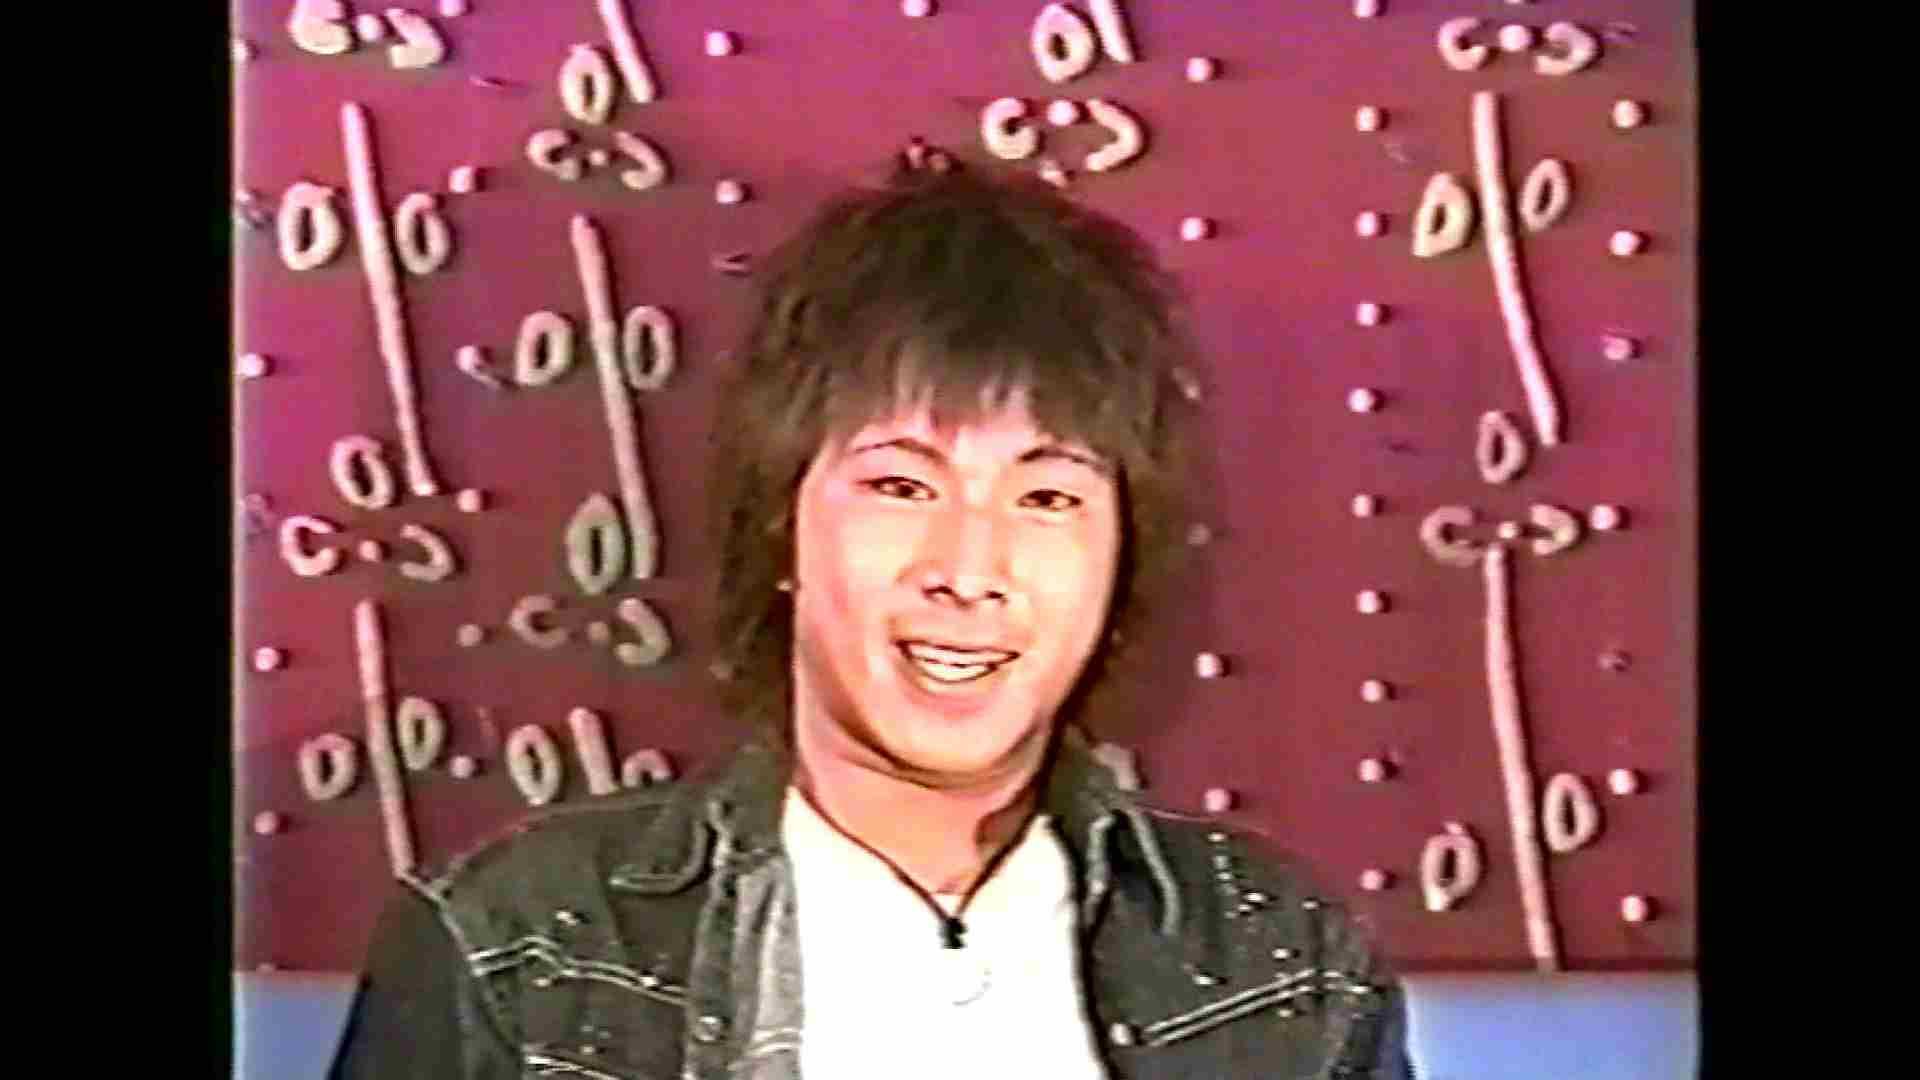 GAYBOY宏のオカズ倉庫Vol.3-1 GAY ゲイセックス画像 103画像 39